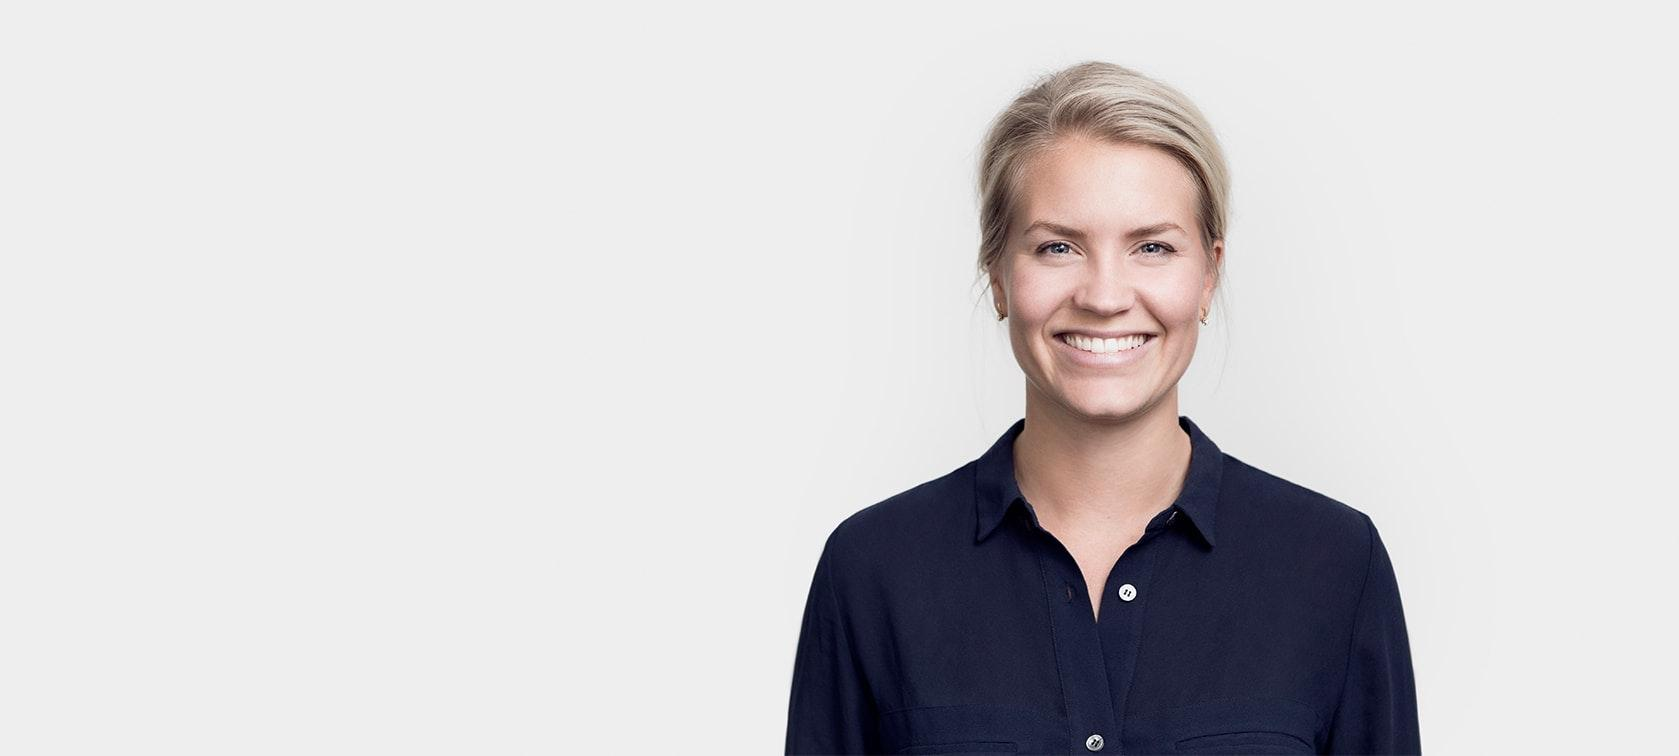 Martina Klingvall, Telness VD